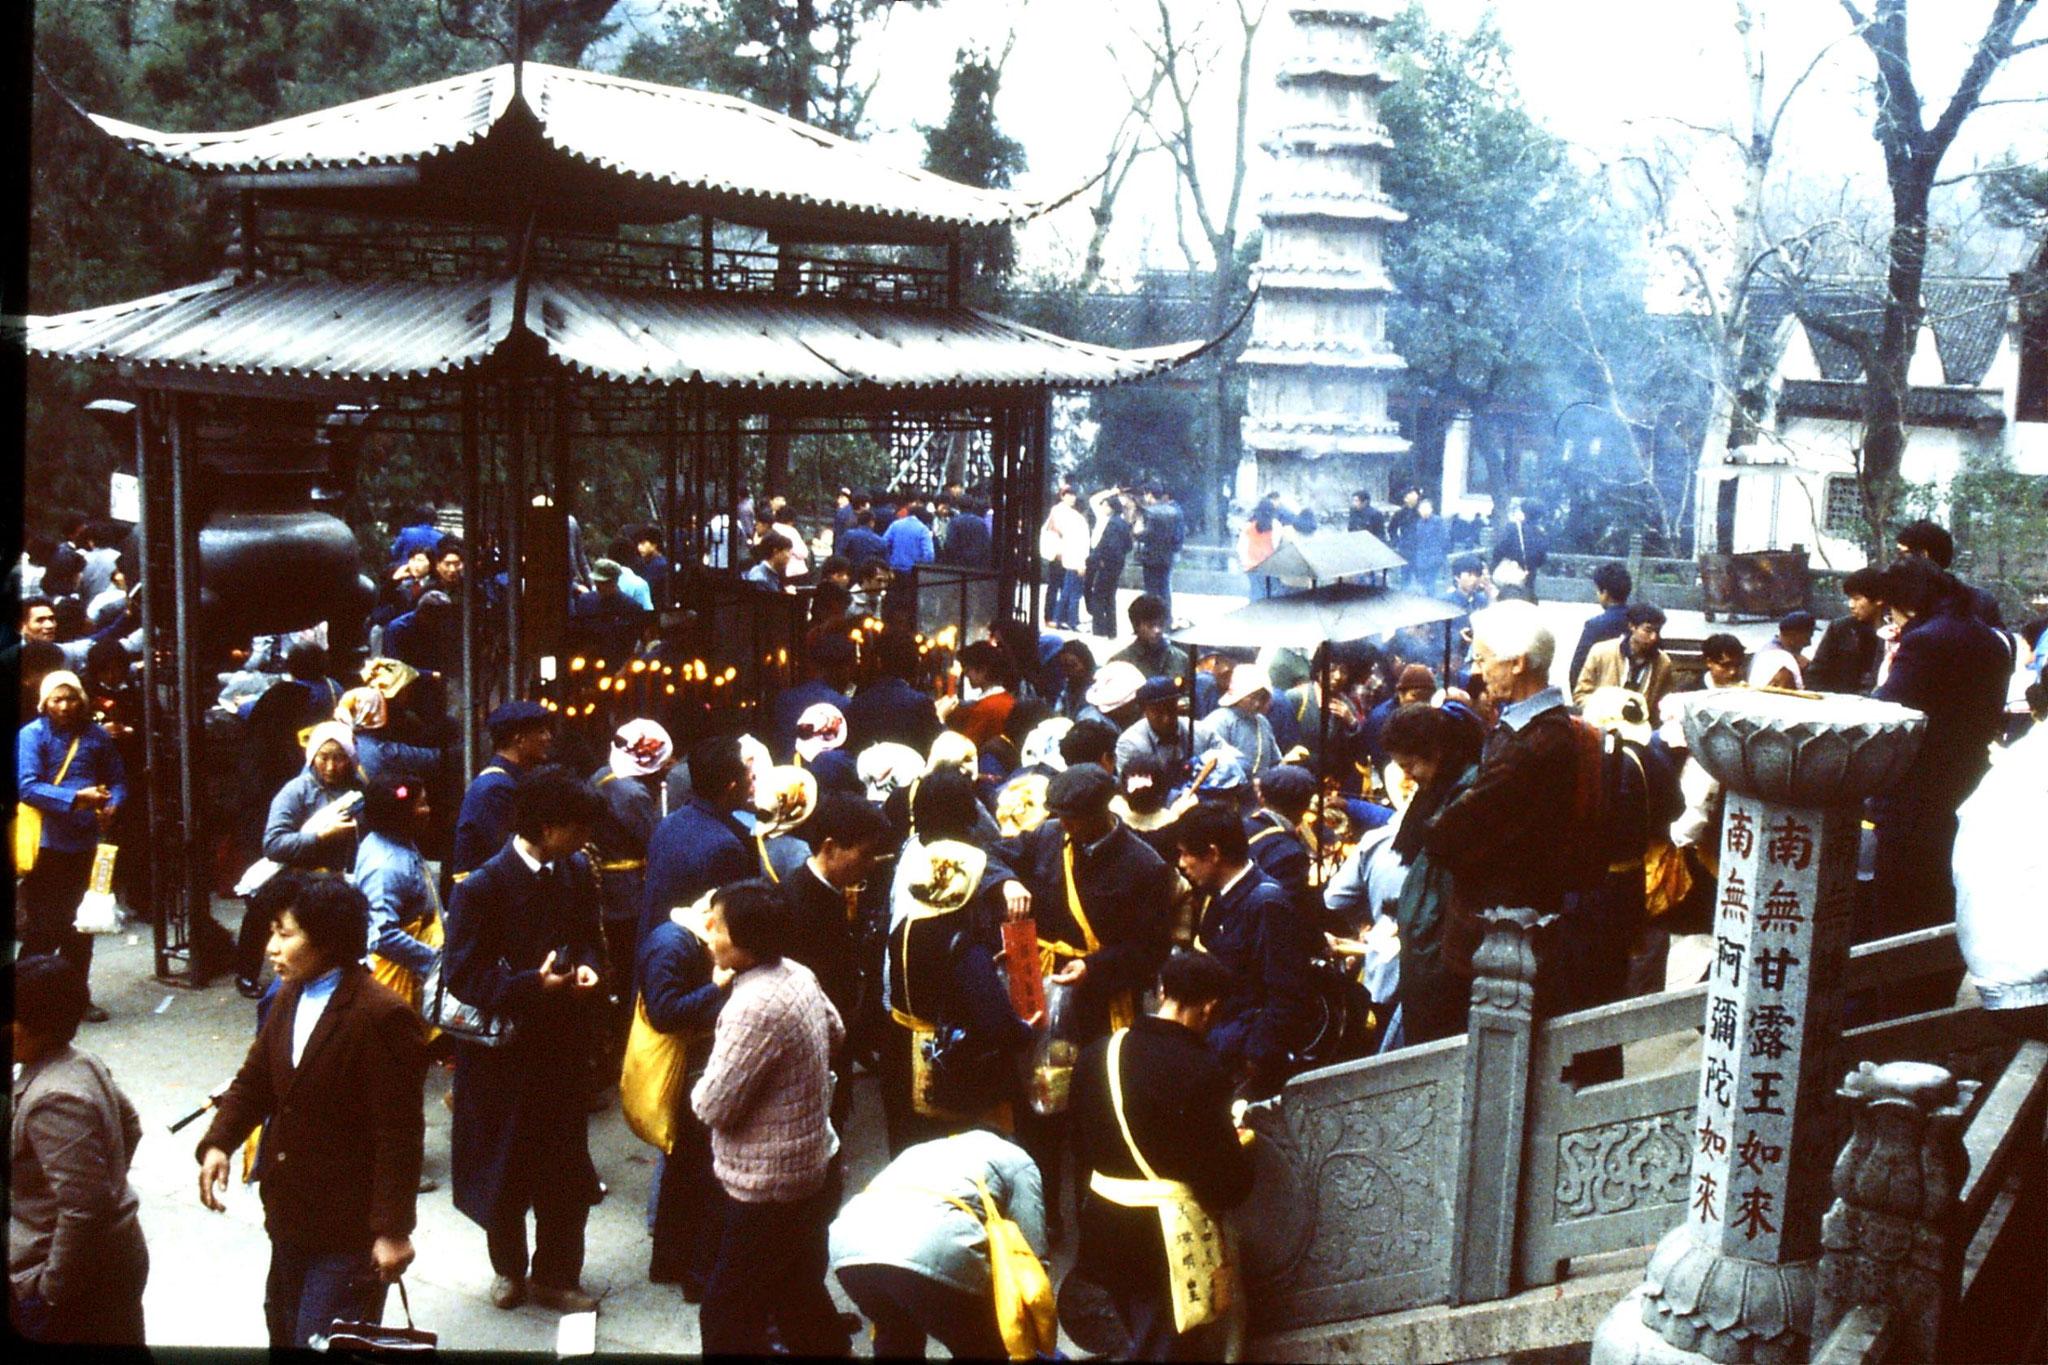 25/3/1989: 11: Hangzhou temple